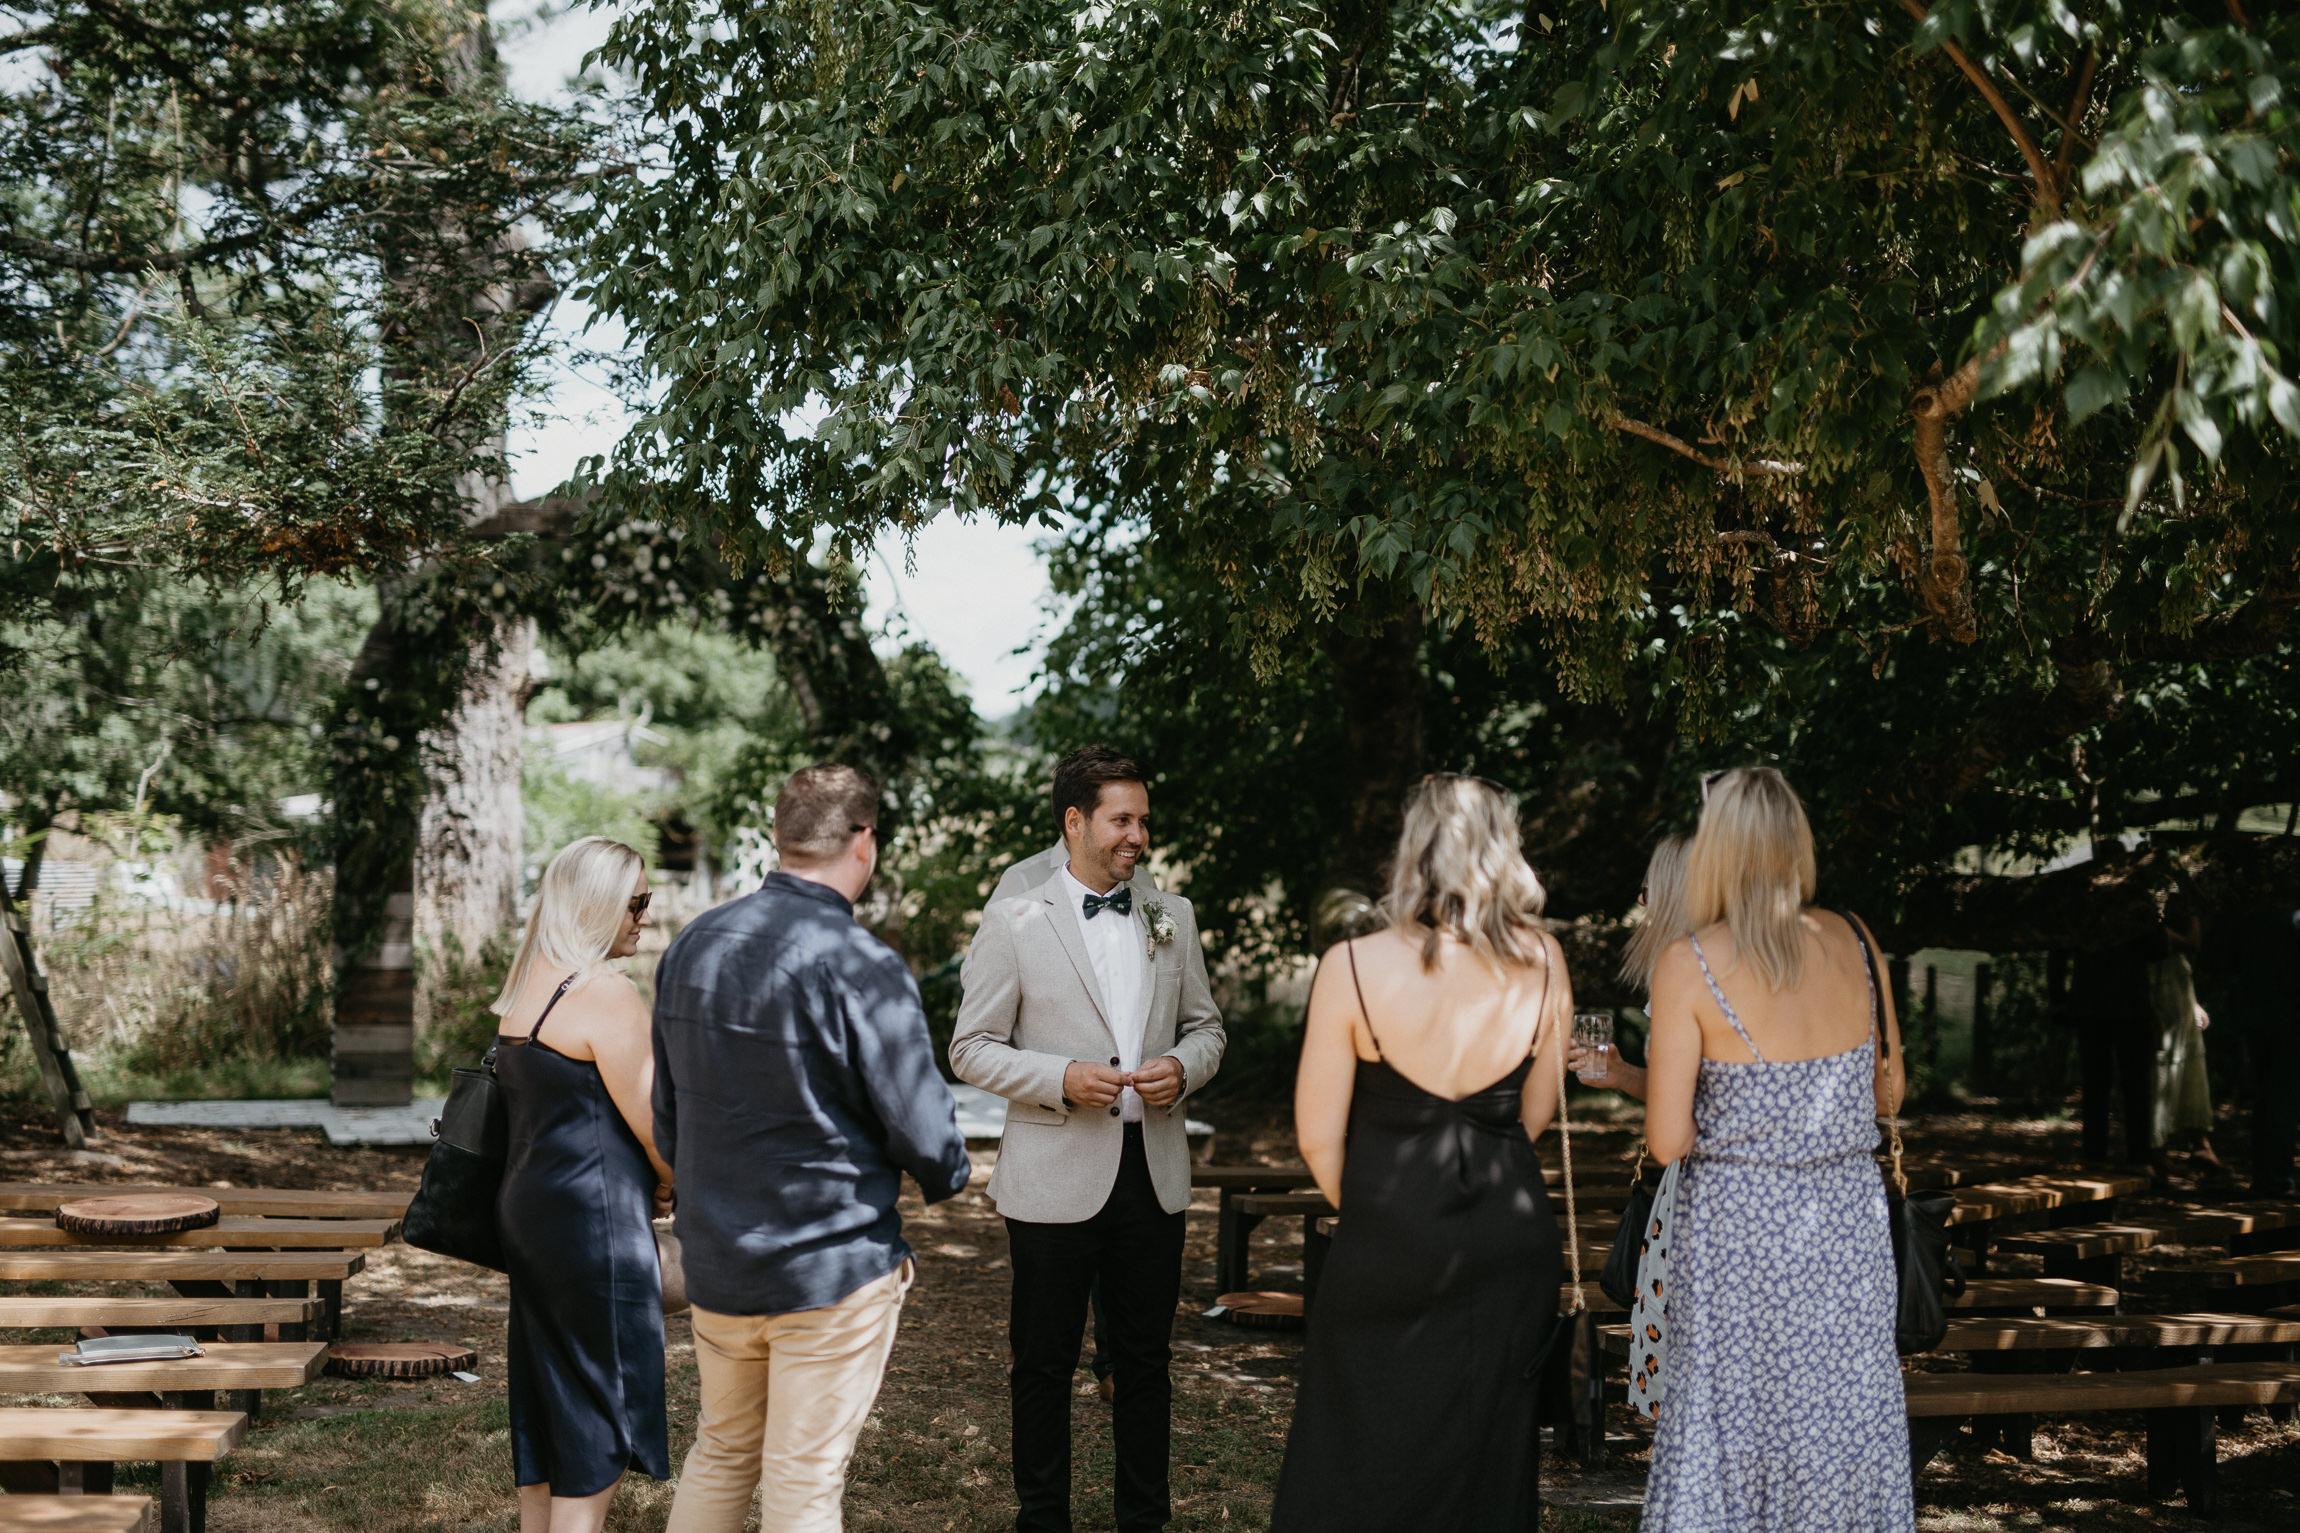 oldforestschool-wedding-blog-91.jpg